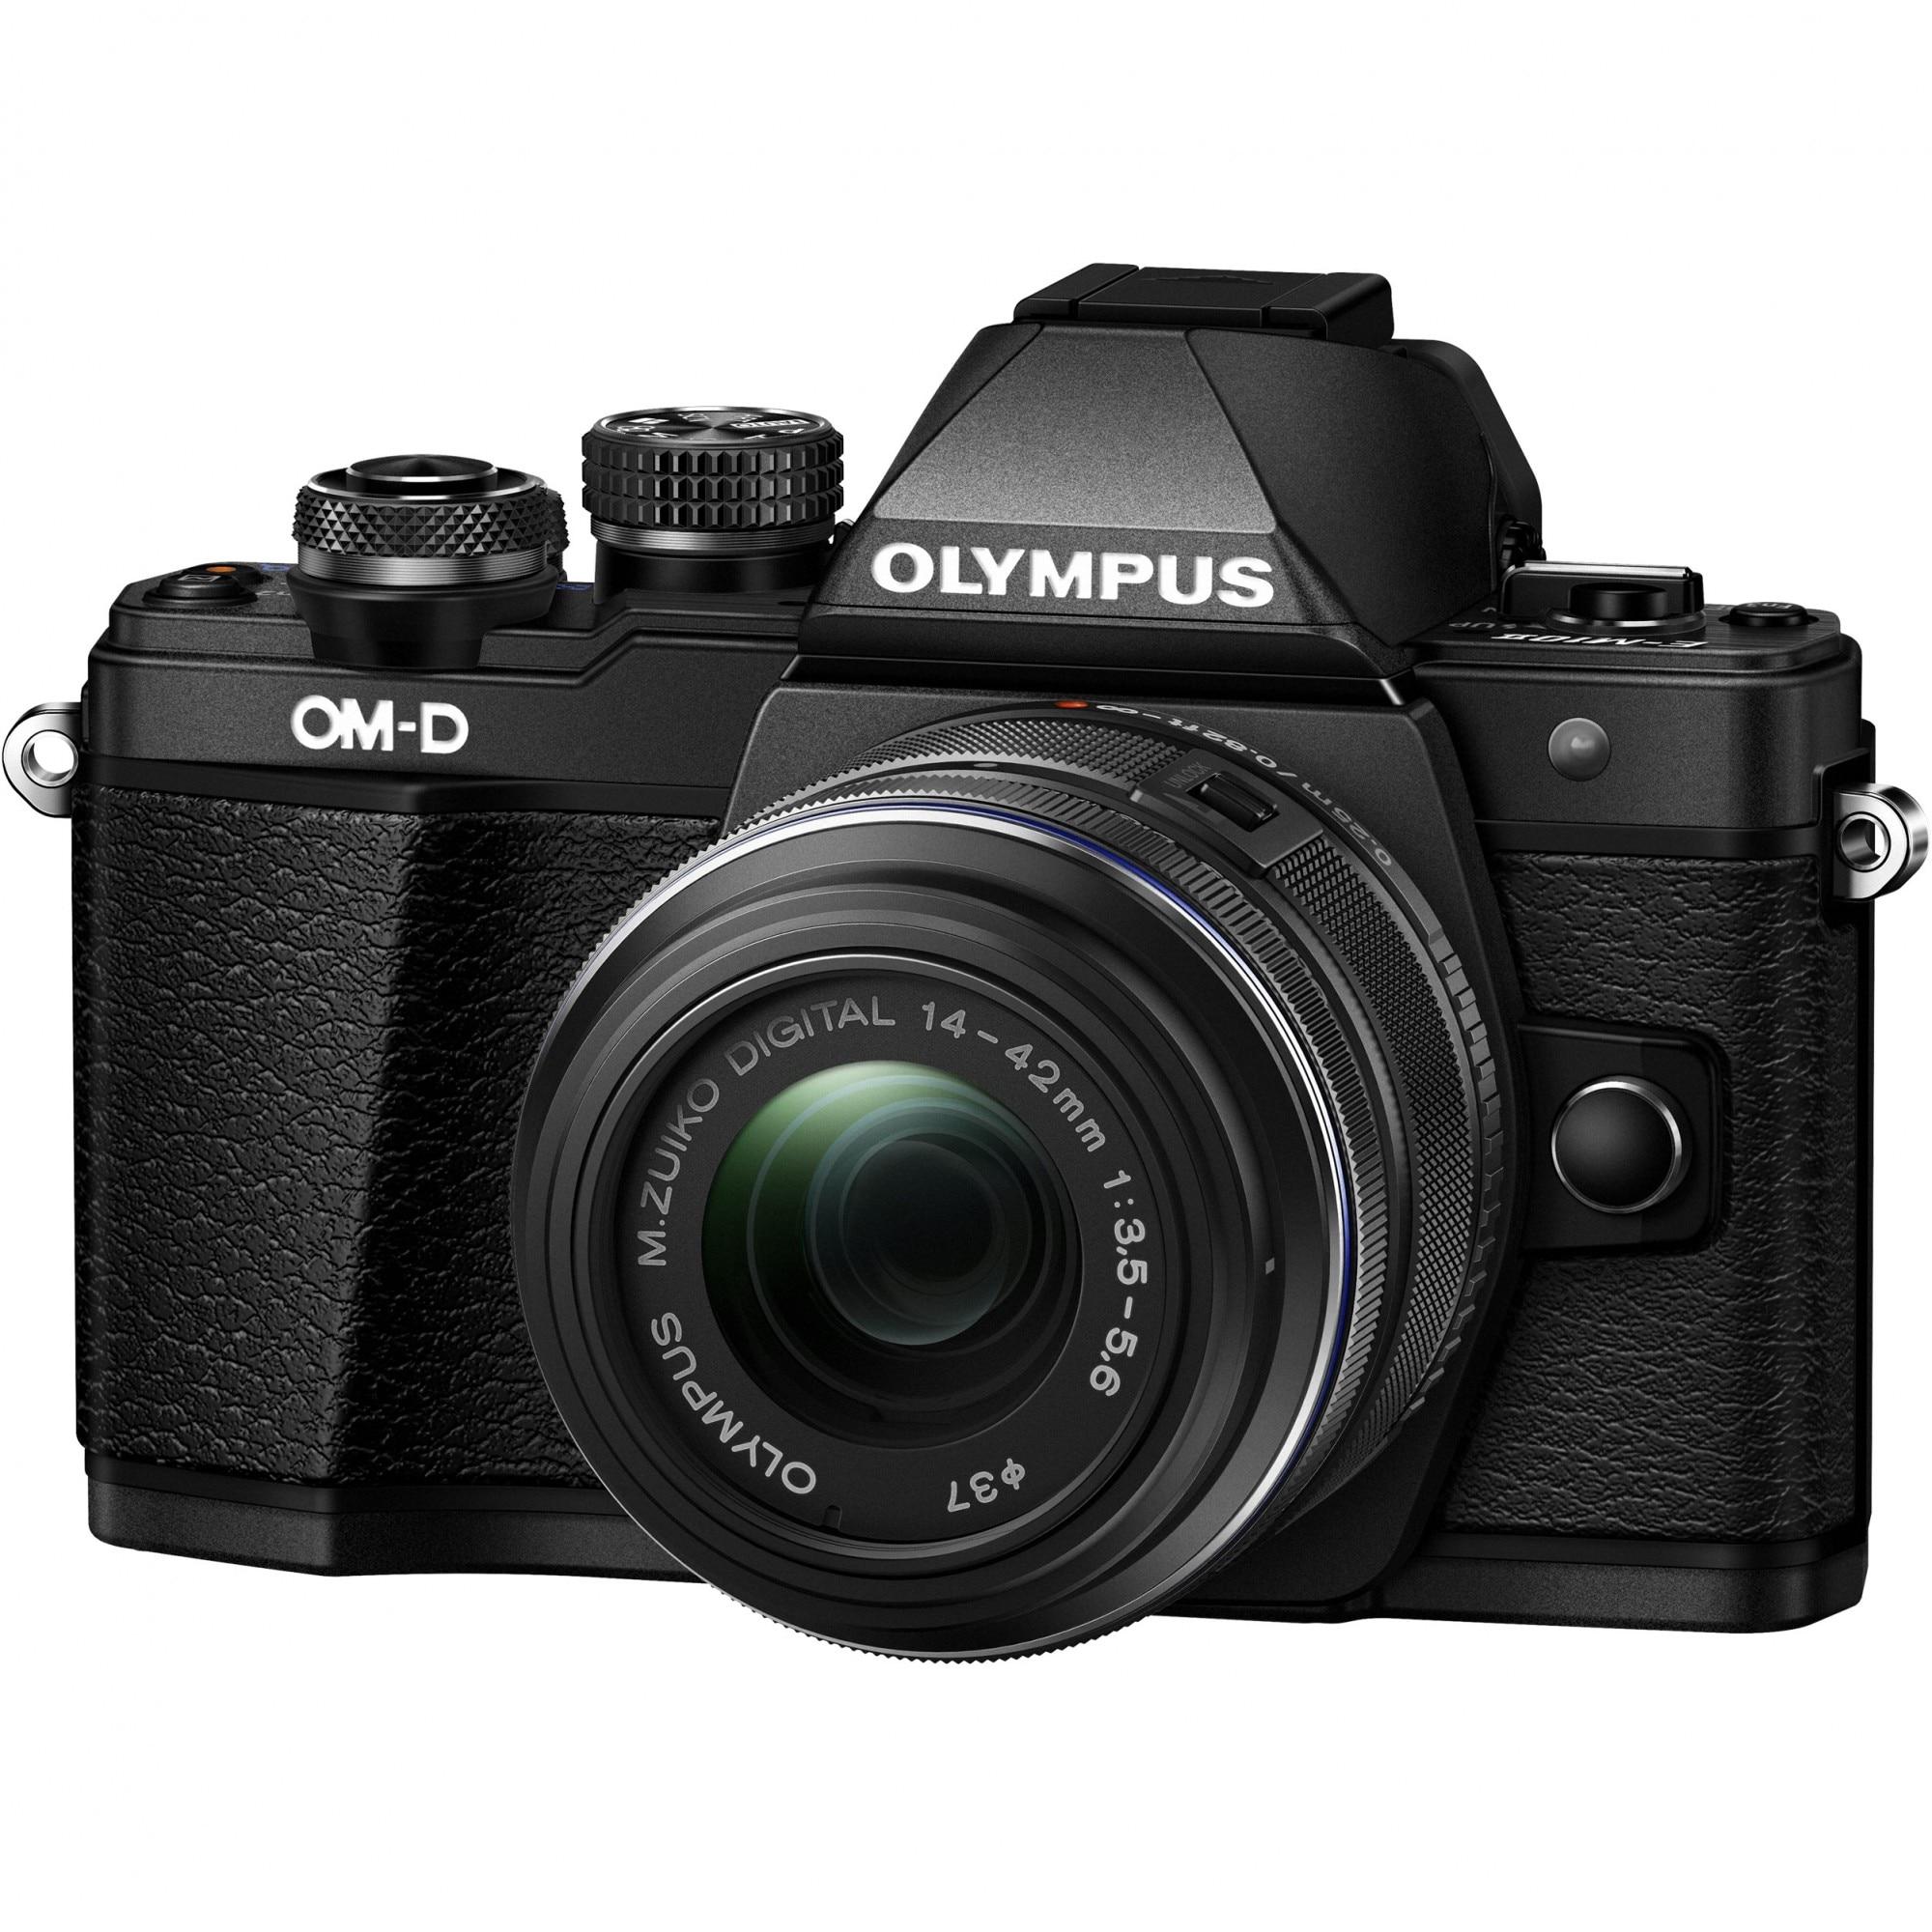 Fotografie Aparat foto mirrorless Olympus OM-D E-M10II 1442 IIR, Black + Obiectiv 14-42mm EZ-M1442 IIR, Black